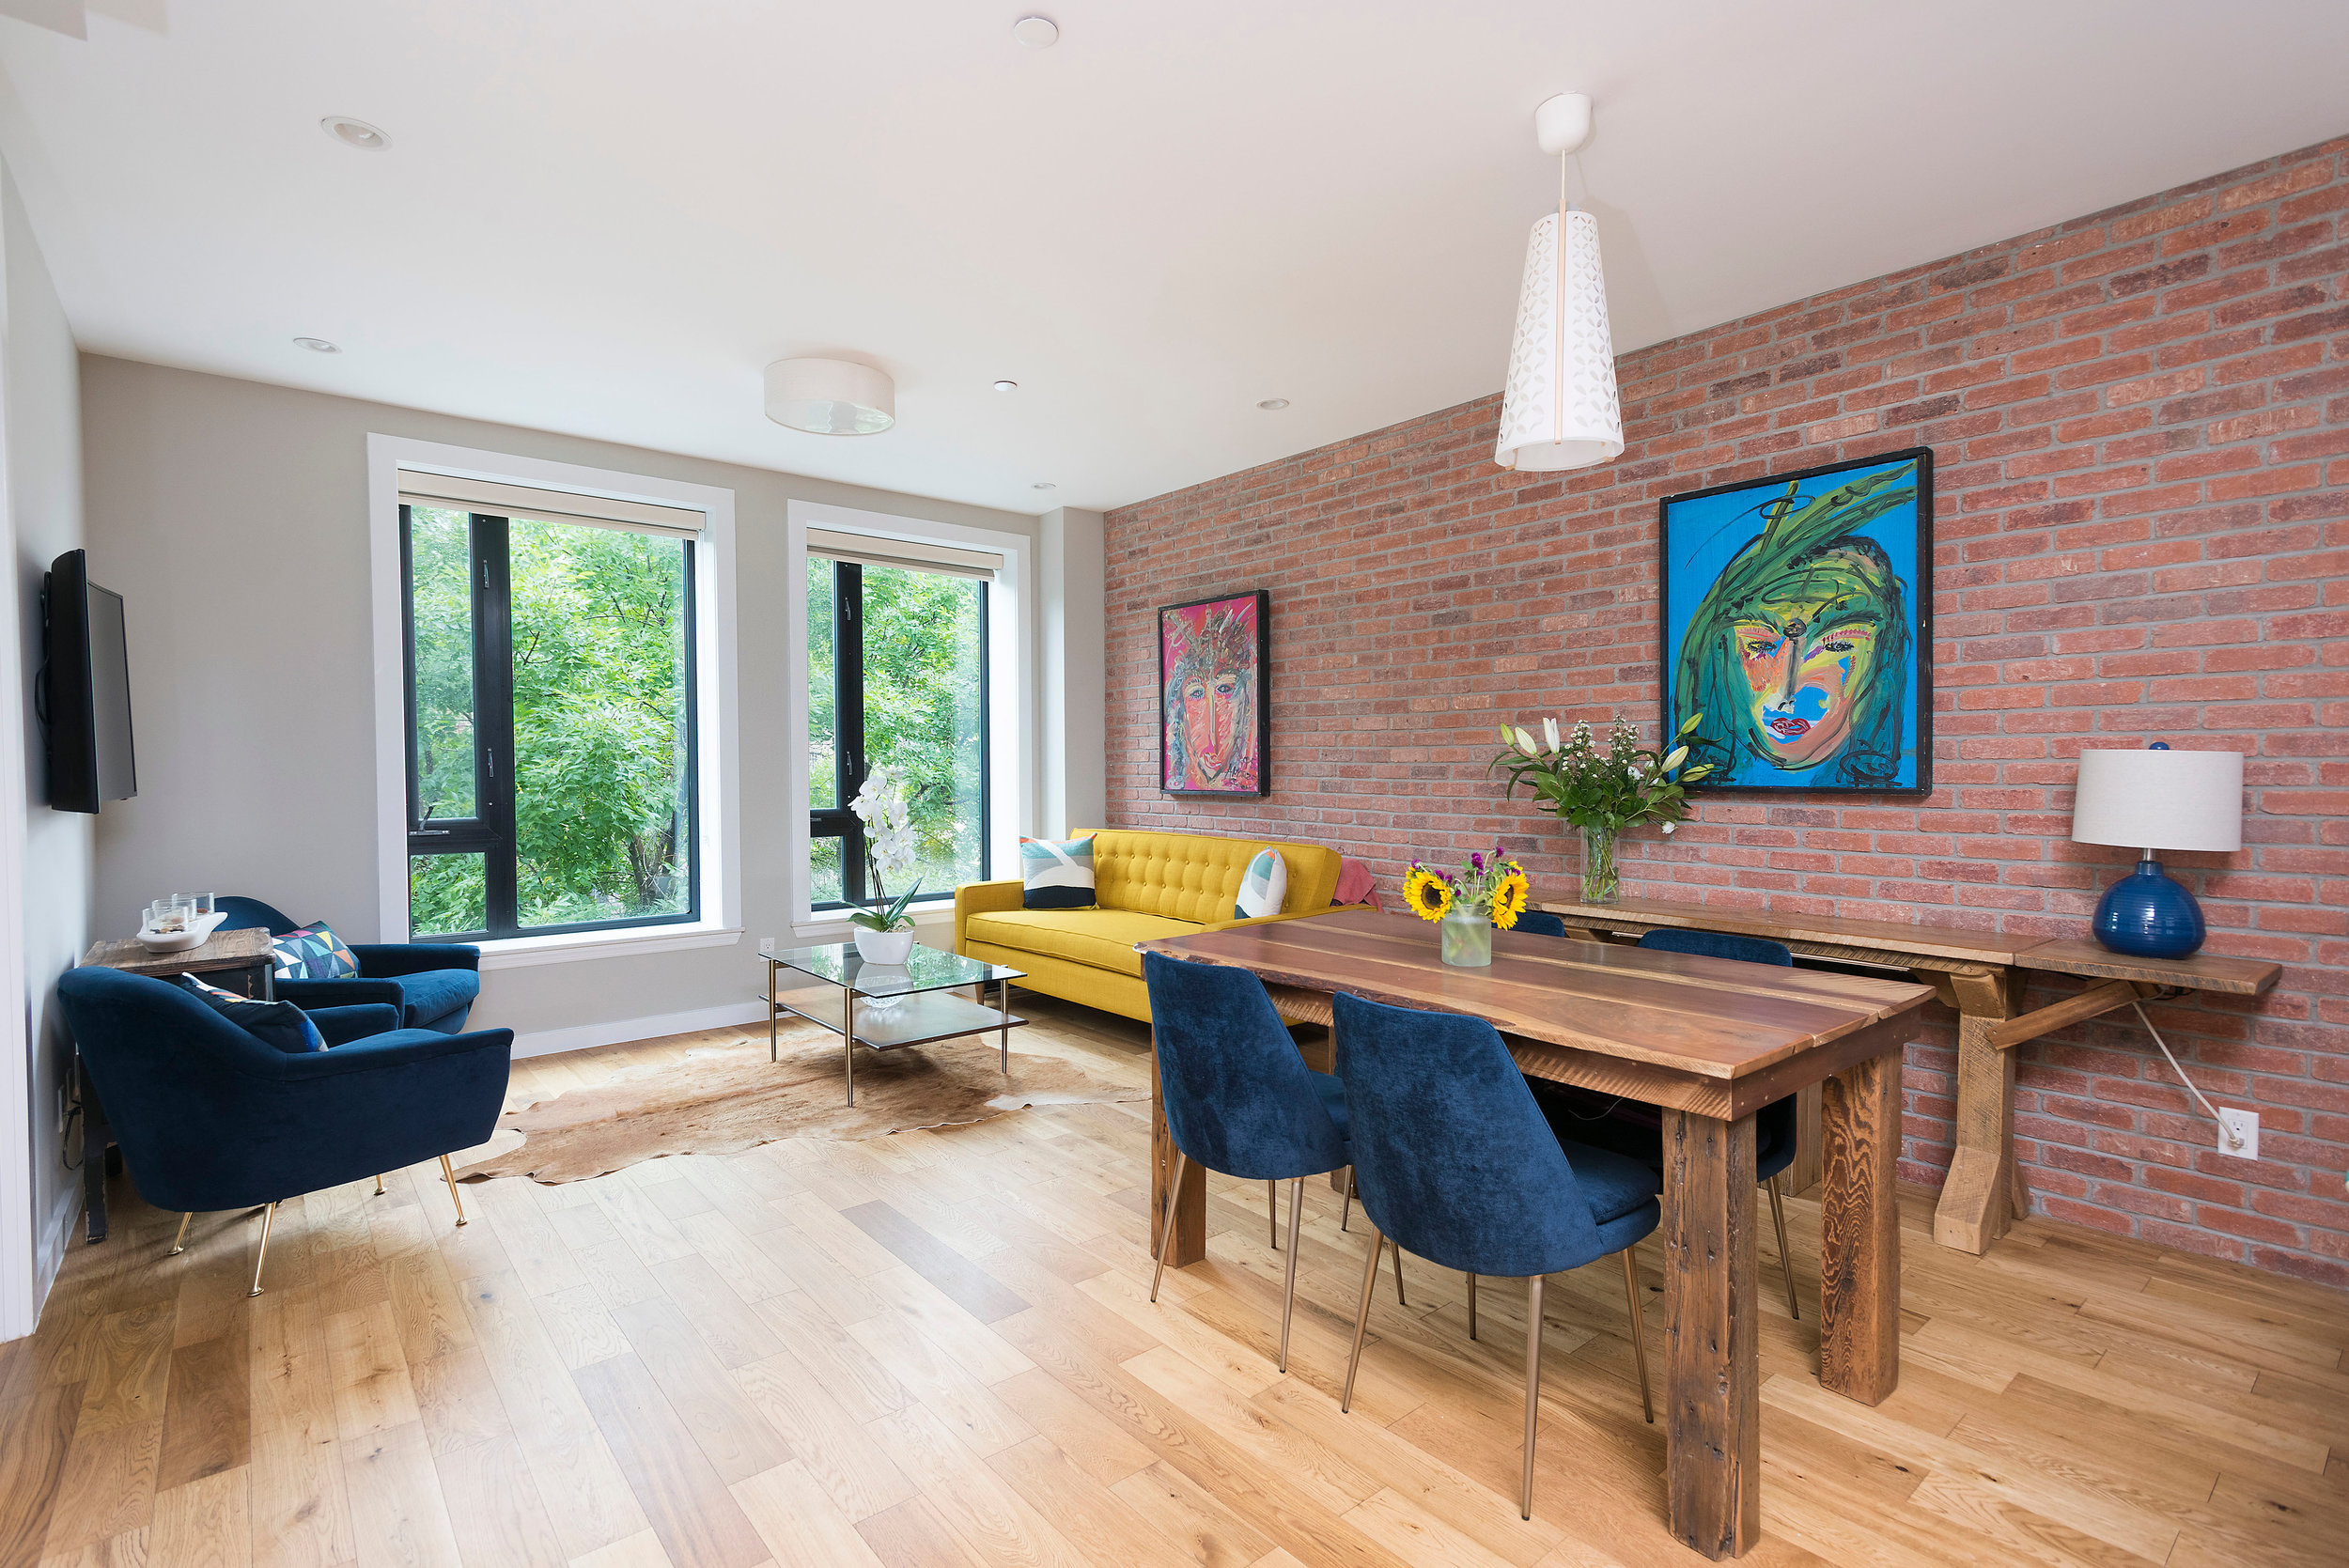 Living Room/ Dining Room - Get Started